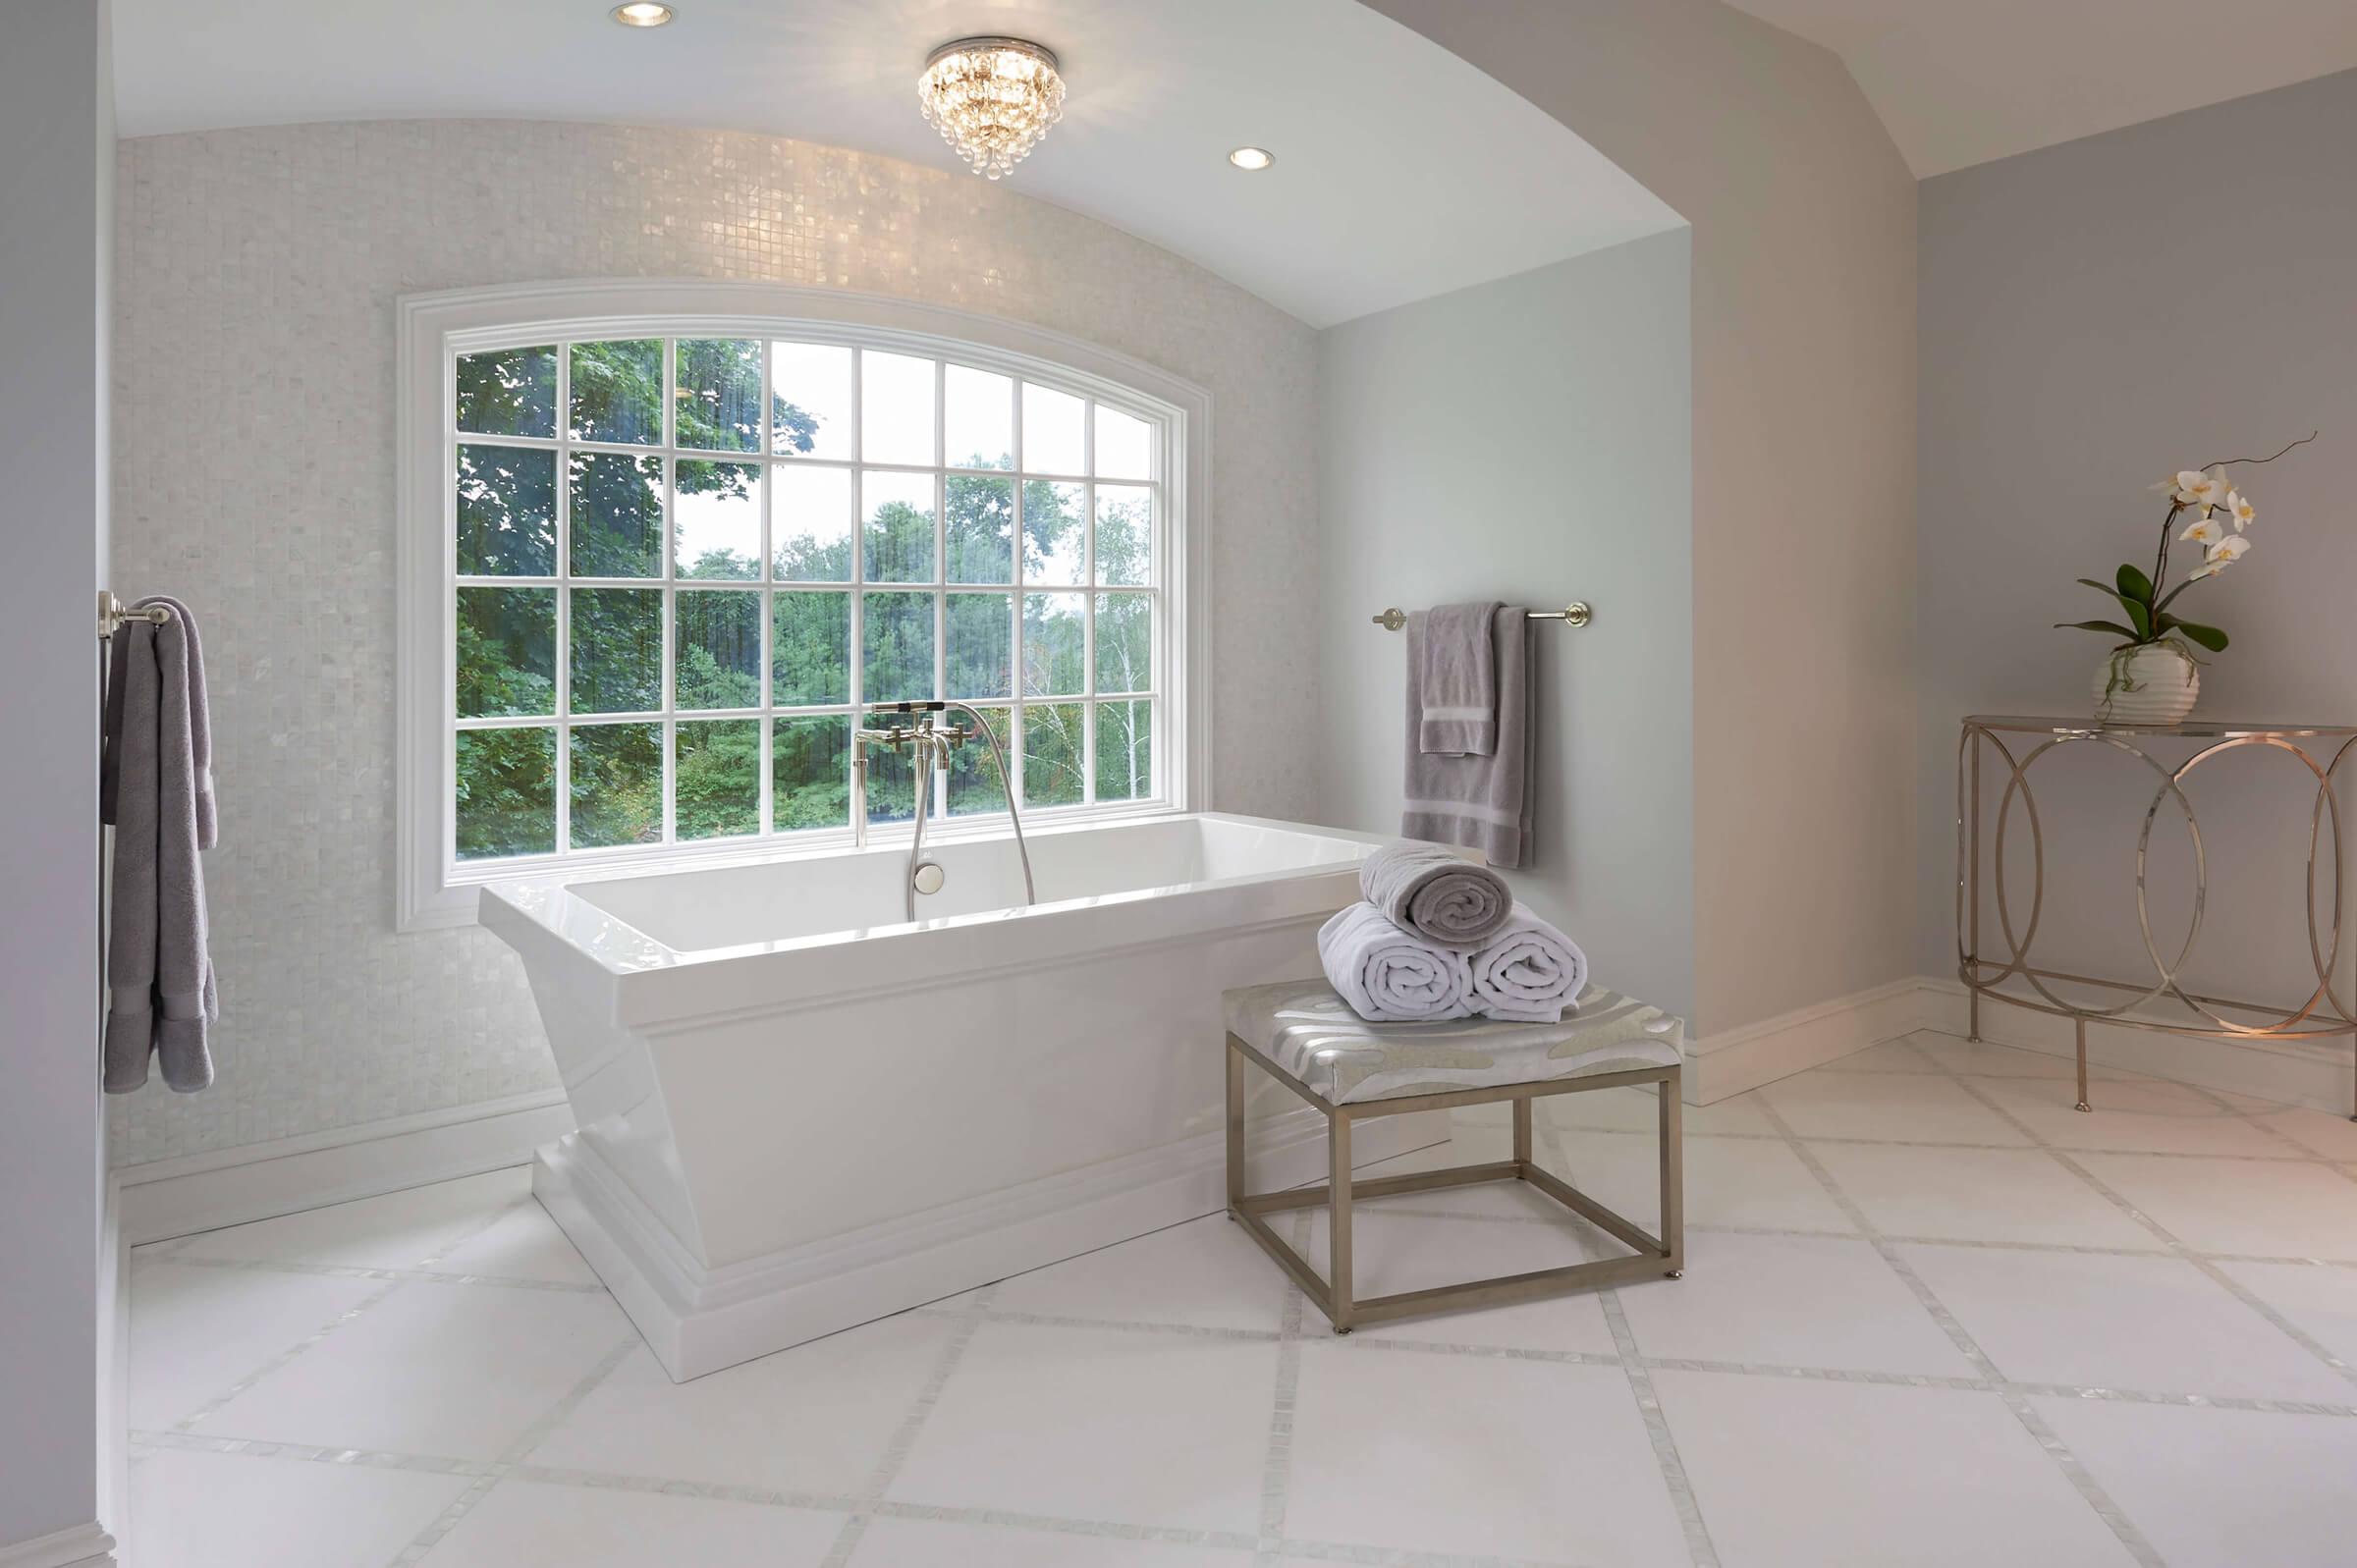 Marble Bath and Mosaic Floor Master Bathroom